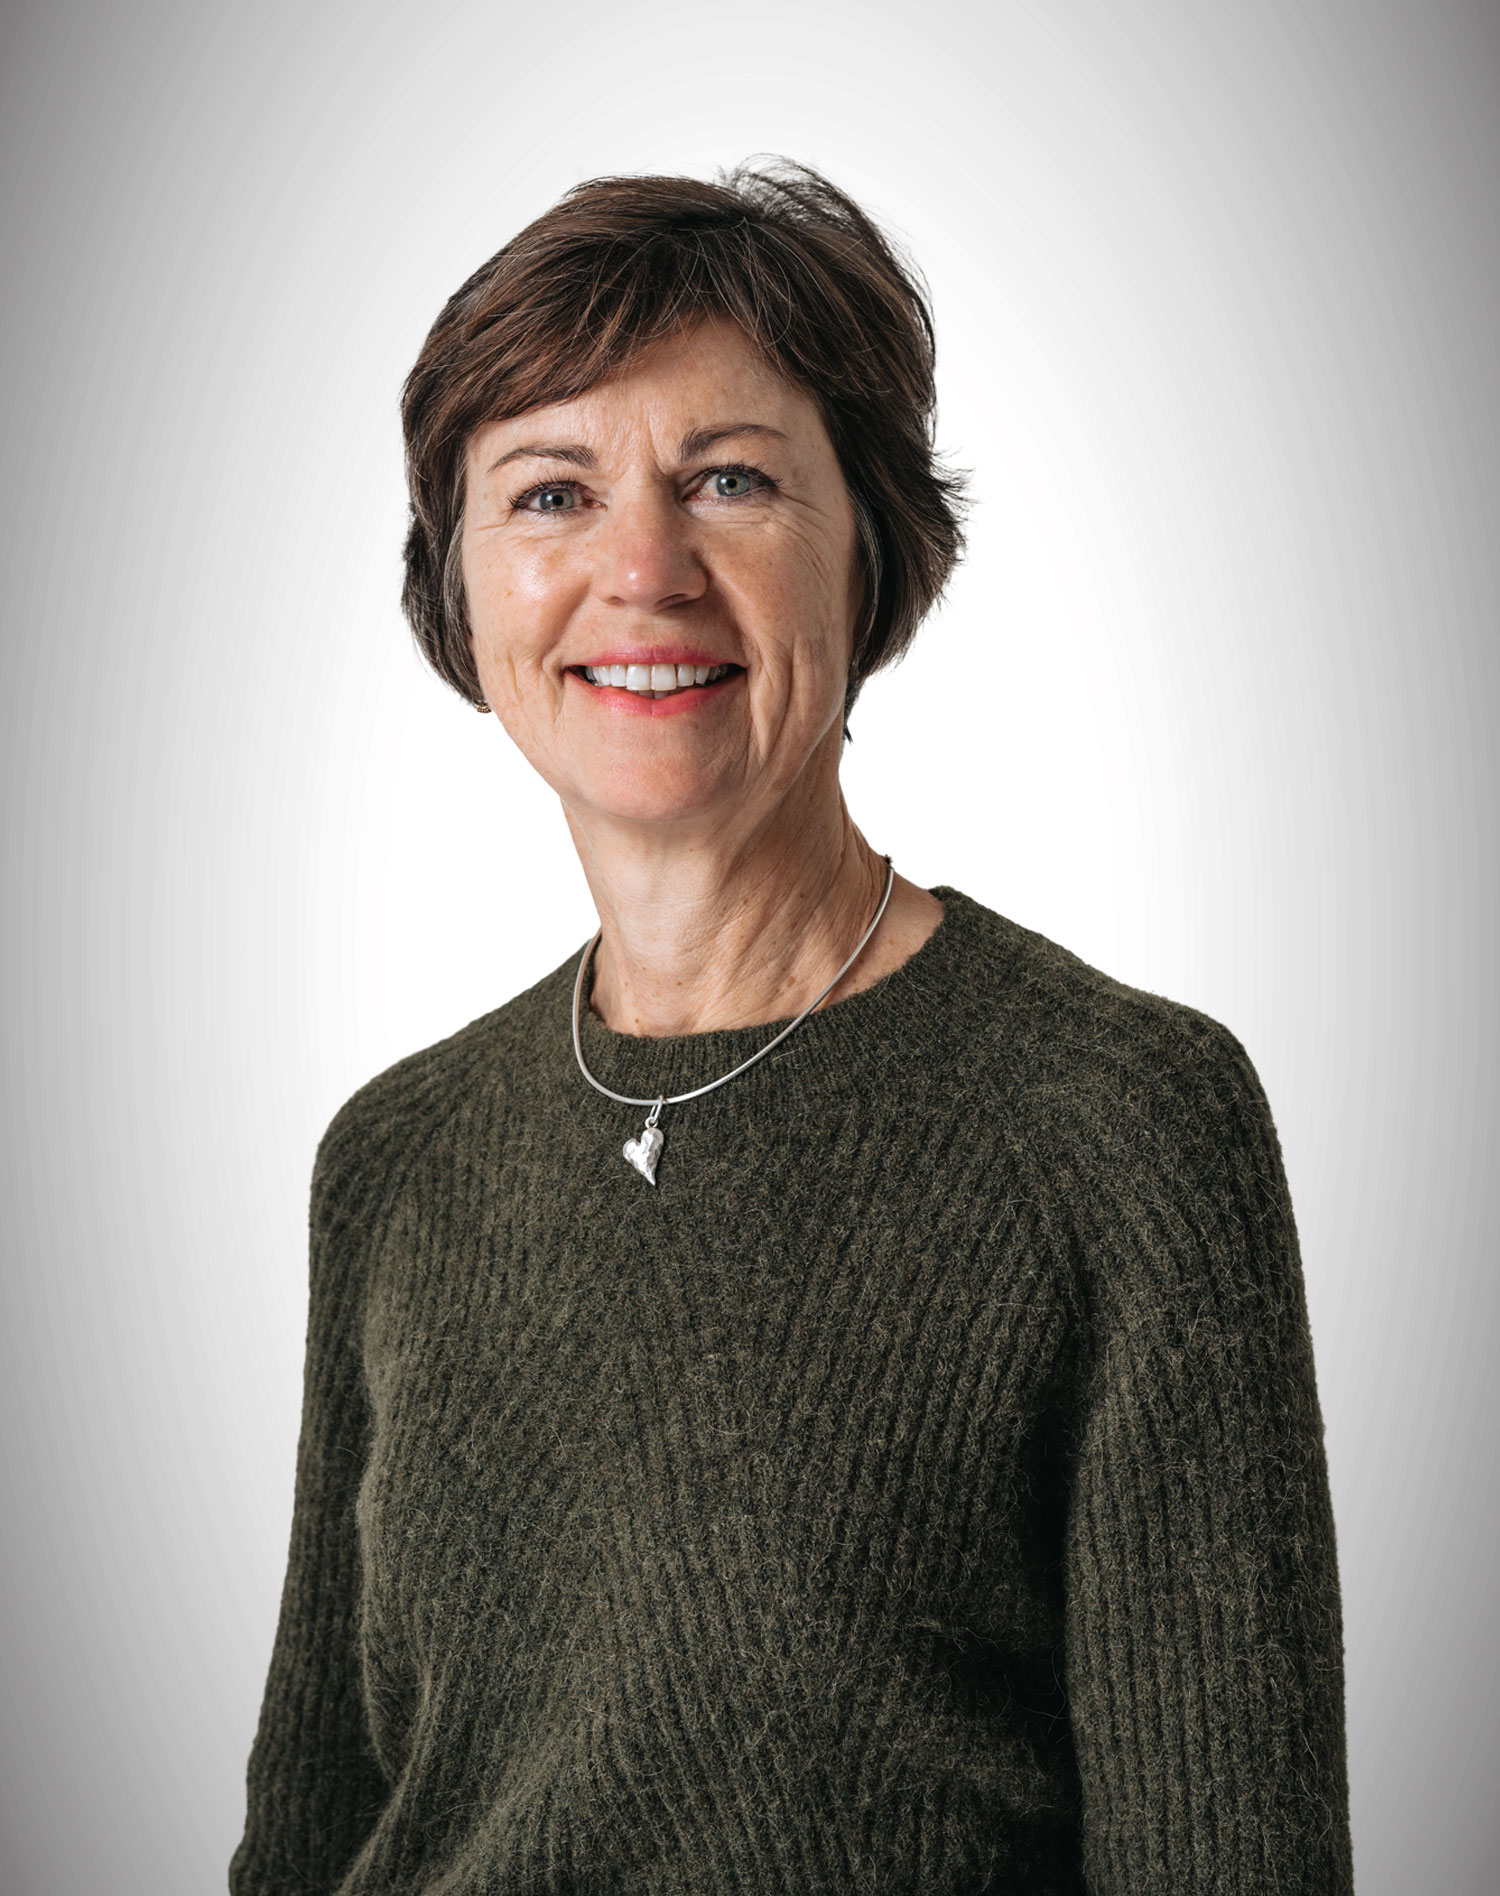 Doris Levisson